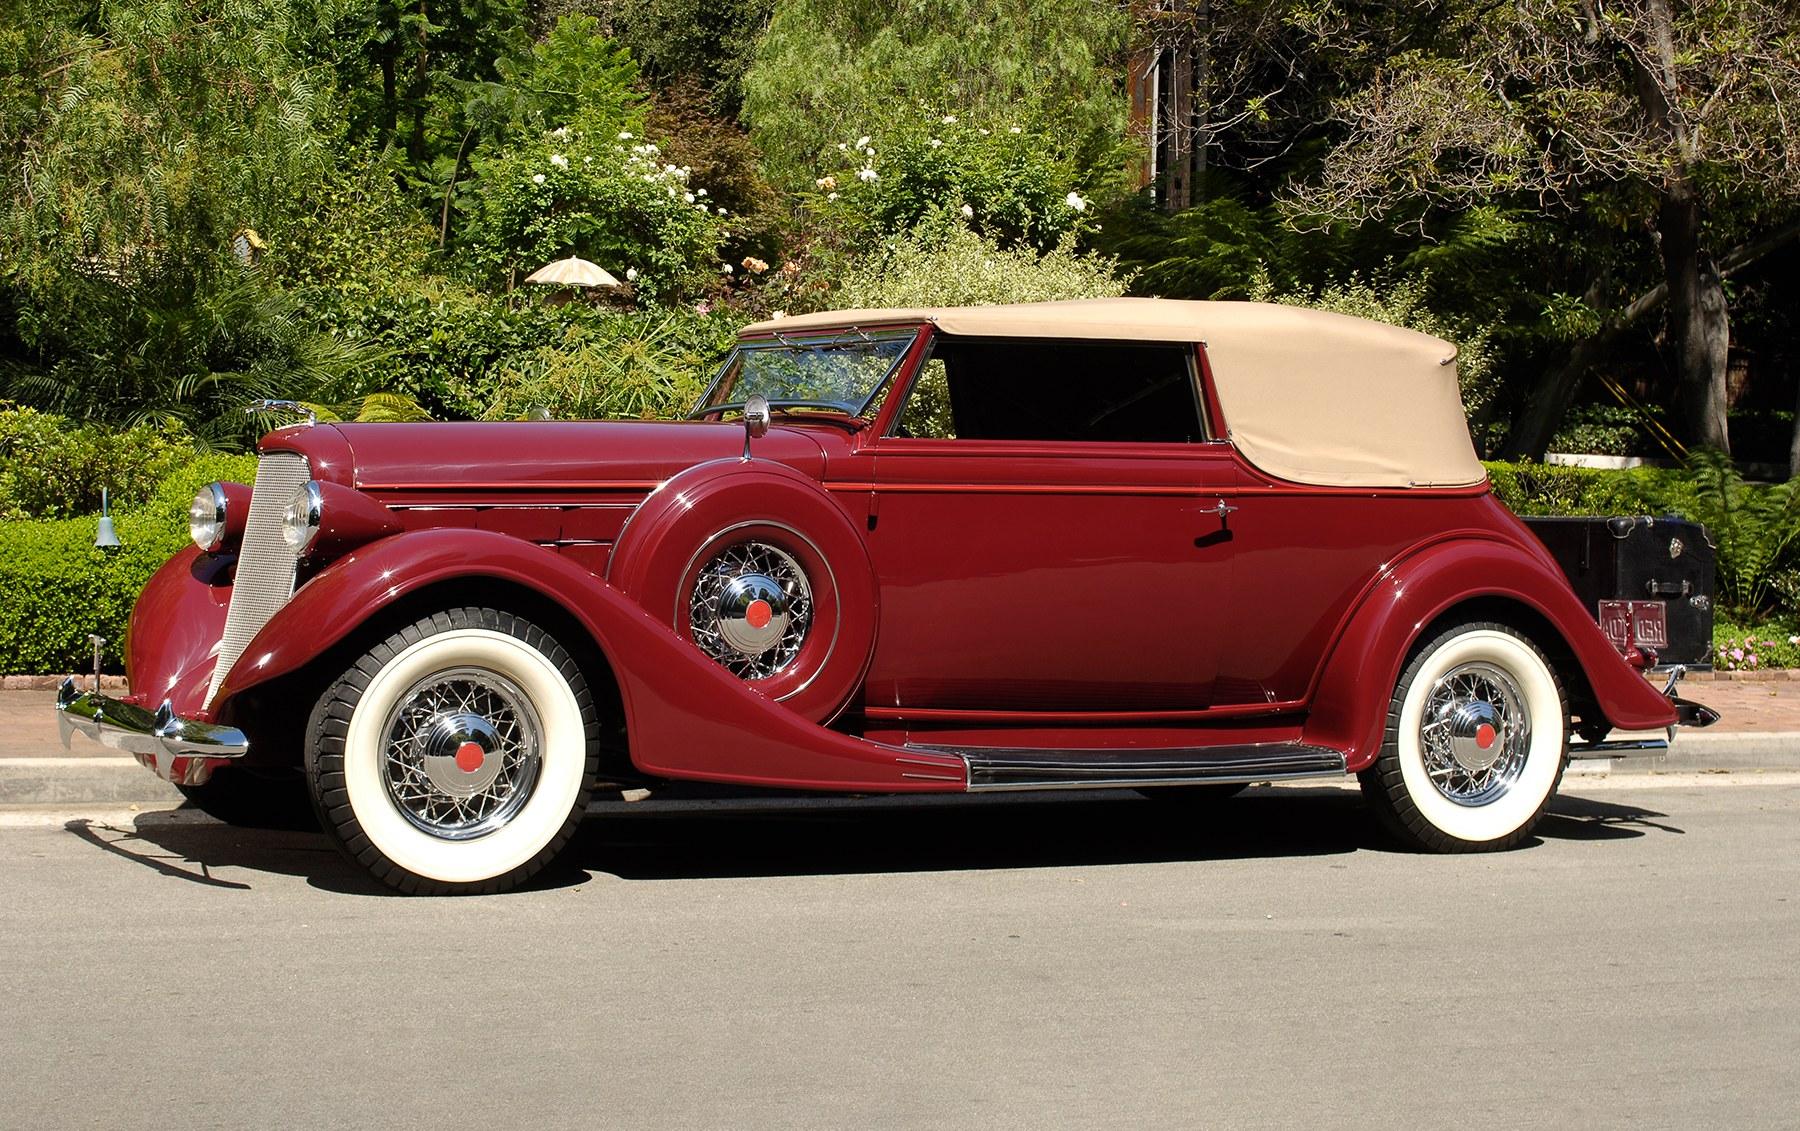 1935 Lincoln KA V-12 Convertible Victoria